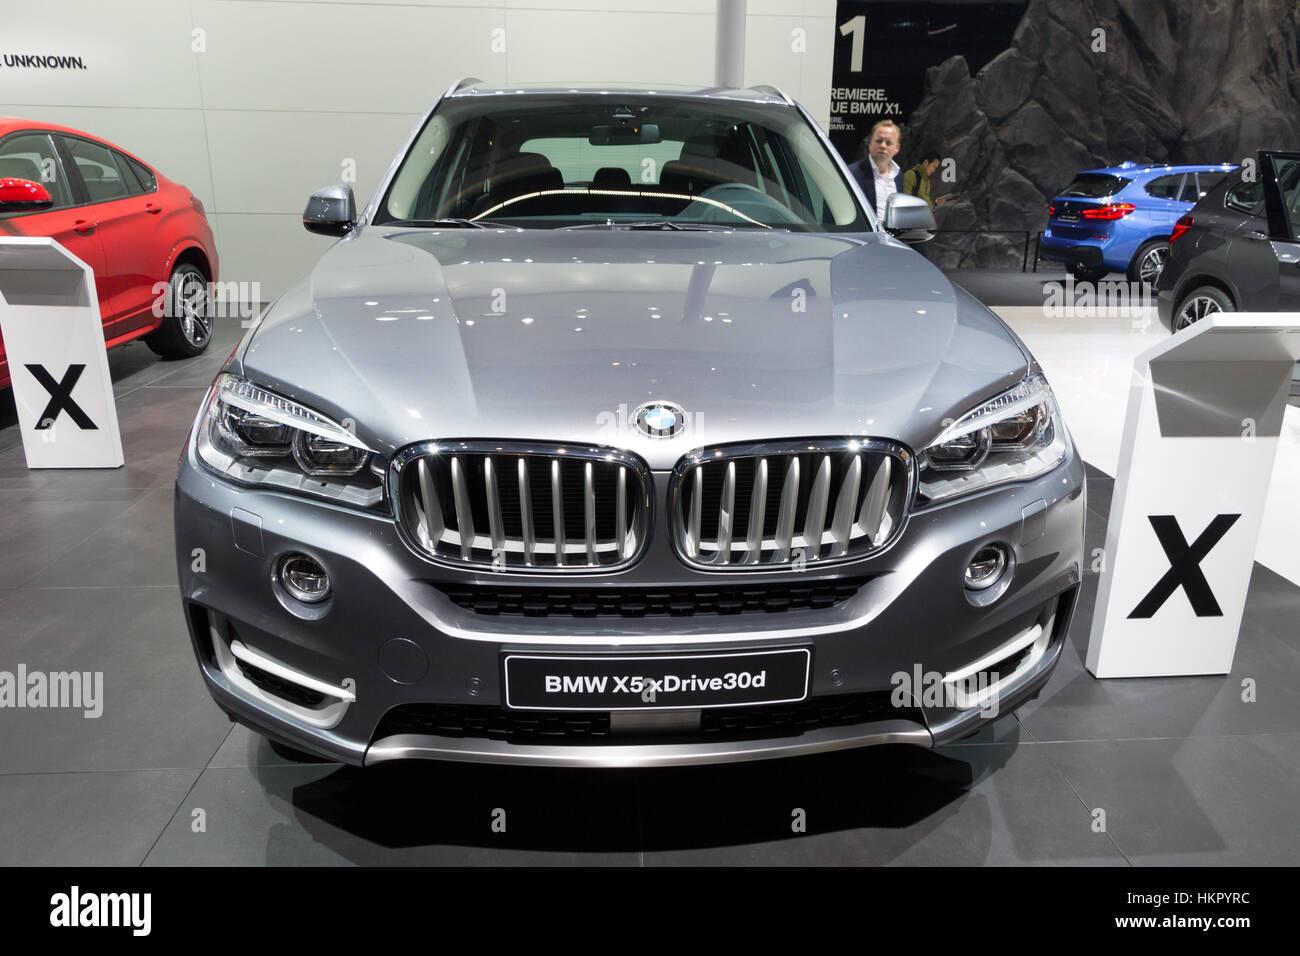 FRANKFURT, GERMANY - SEP 16, 2015: BMW X5 xDrive30d shown at the IAA 2015. - Stock Image